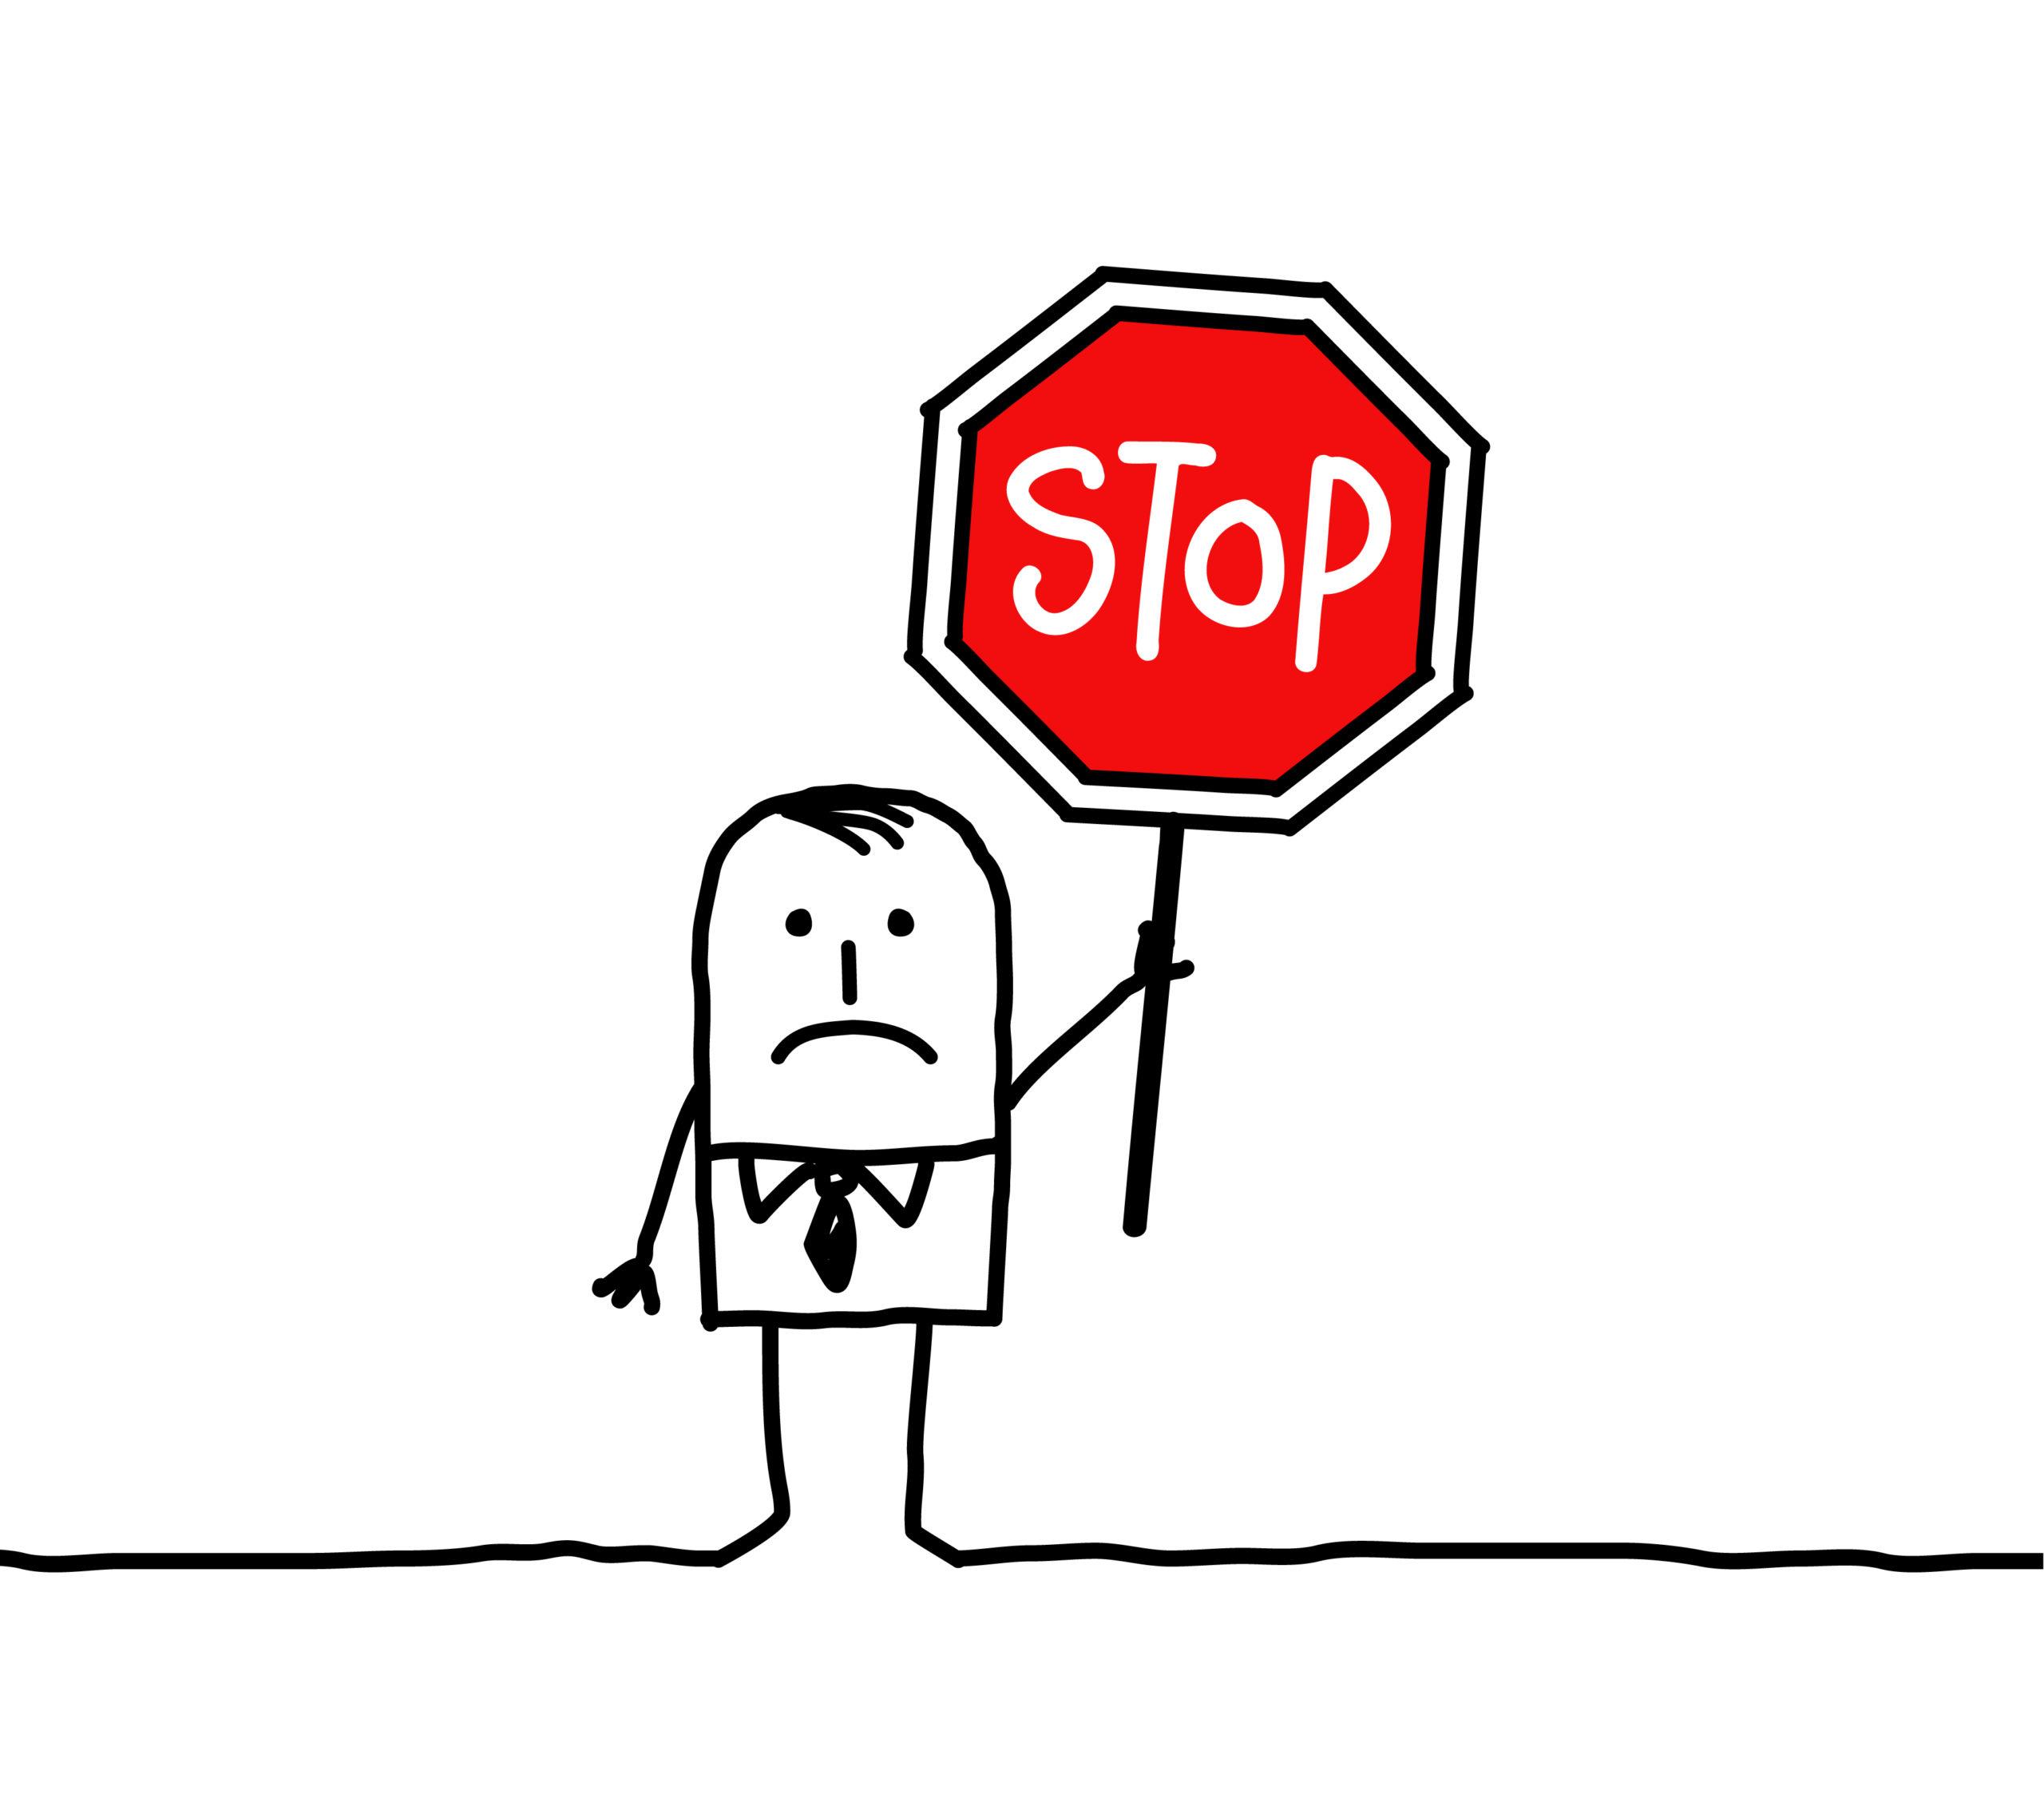 STOP!ミックスボイスが地声っぽくならないアナタへ【ボイストレーニング練習改善】